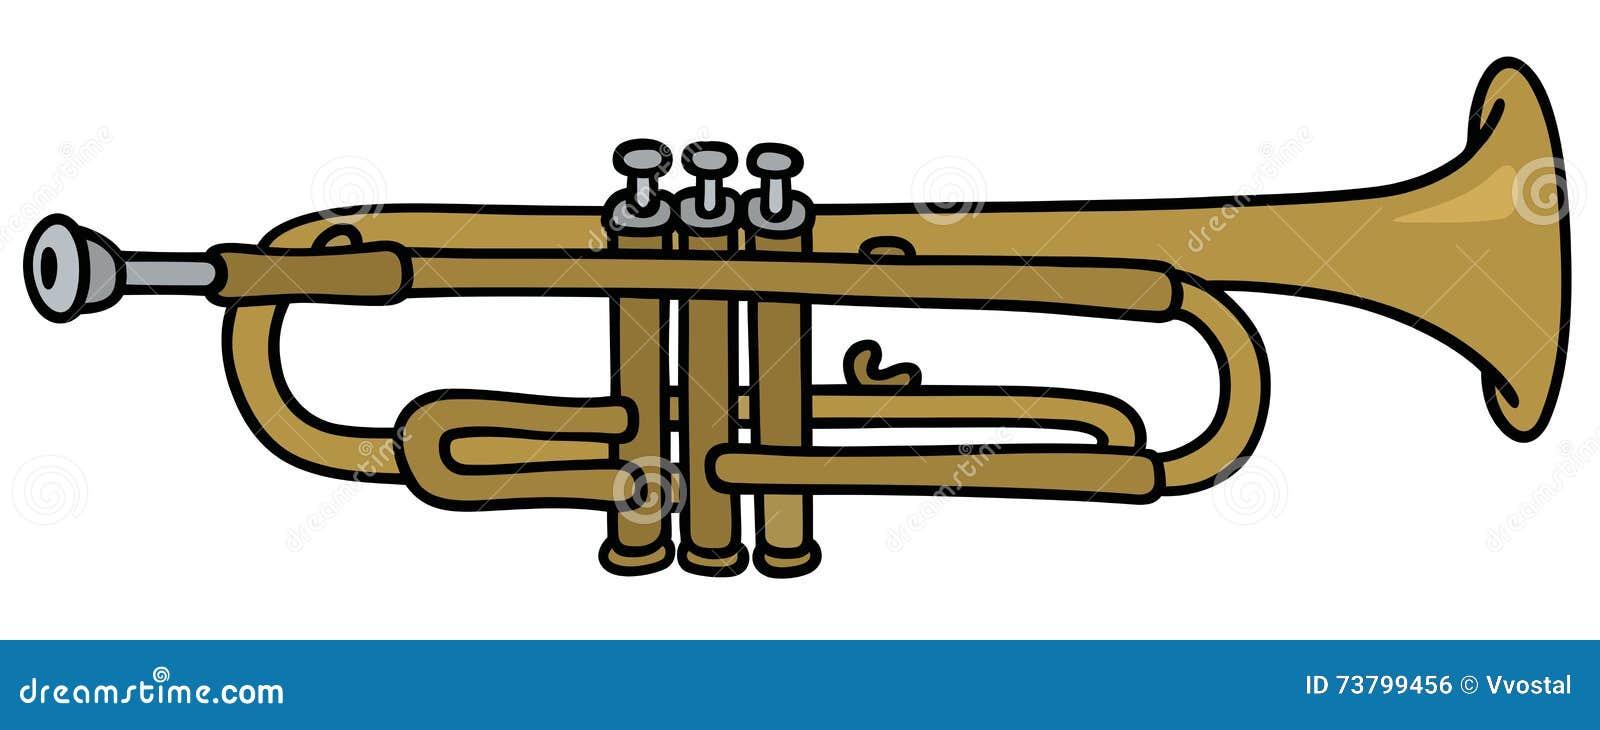 Trompette classique